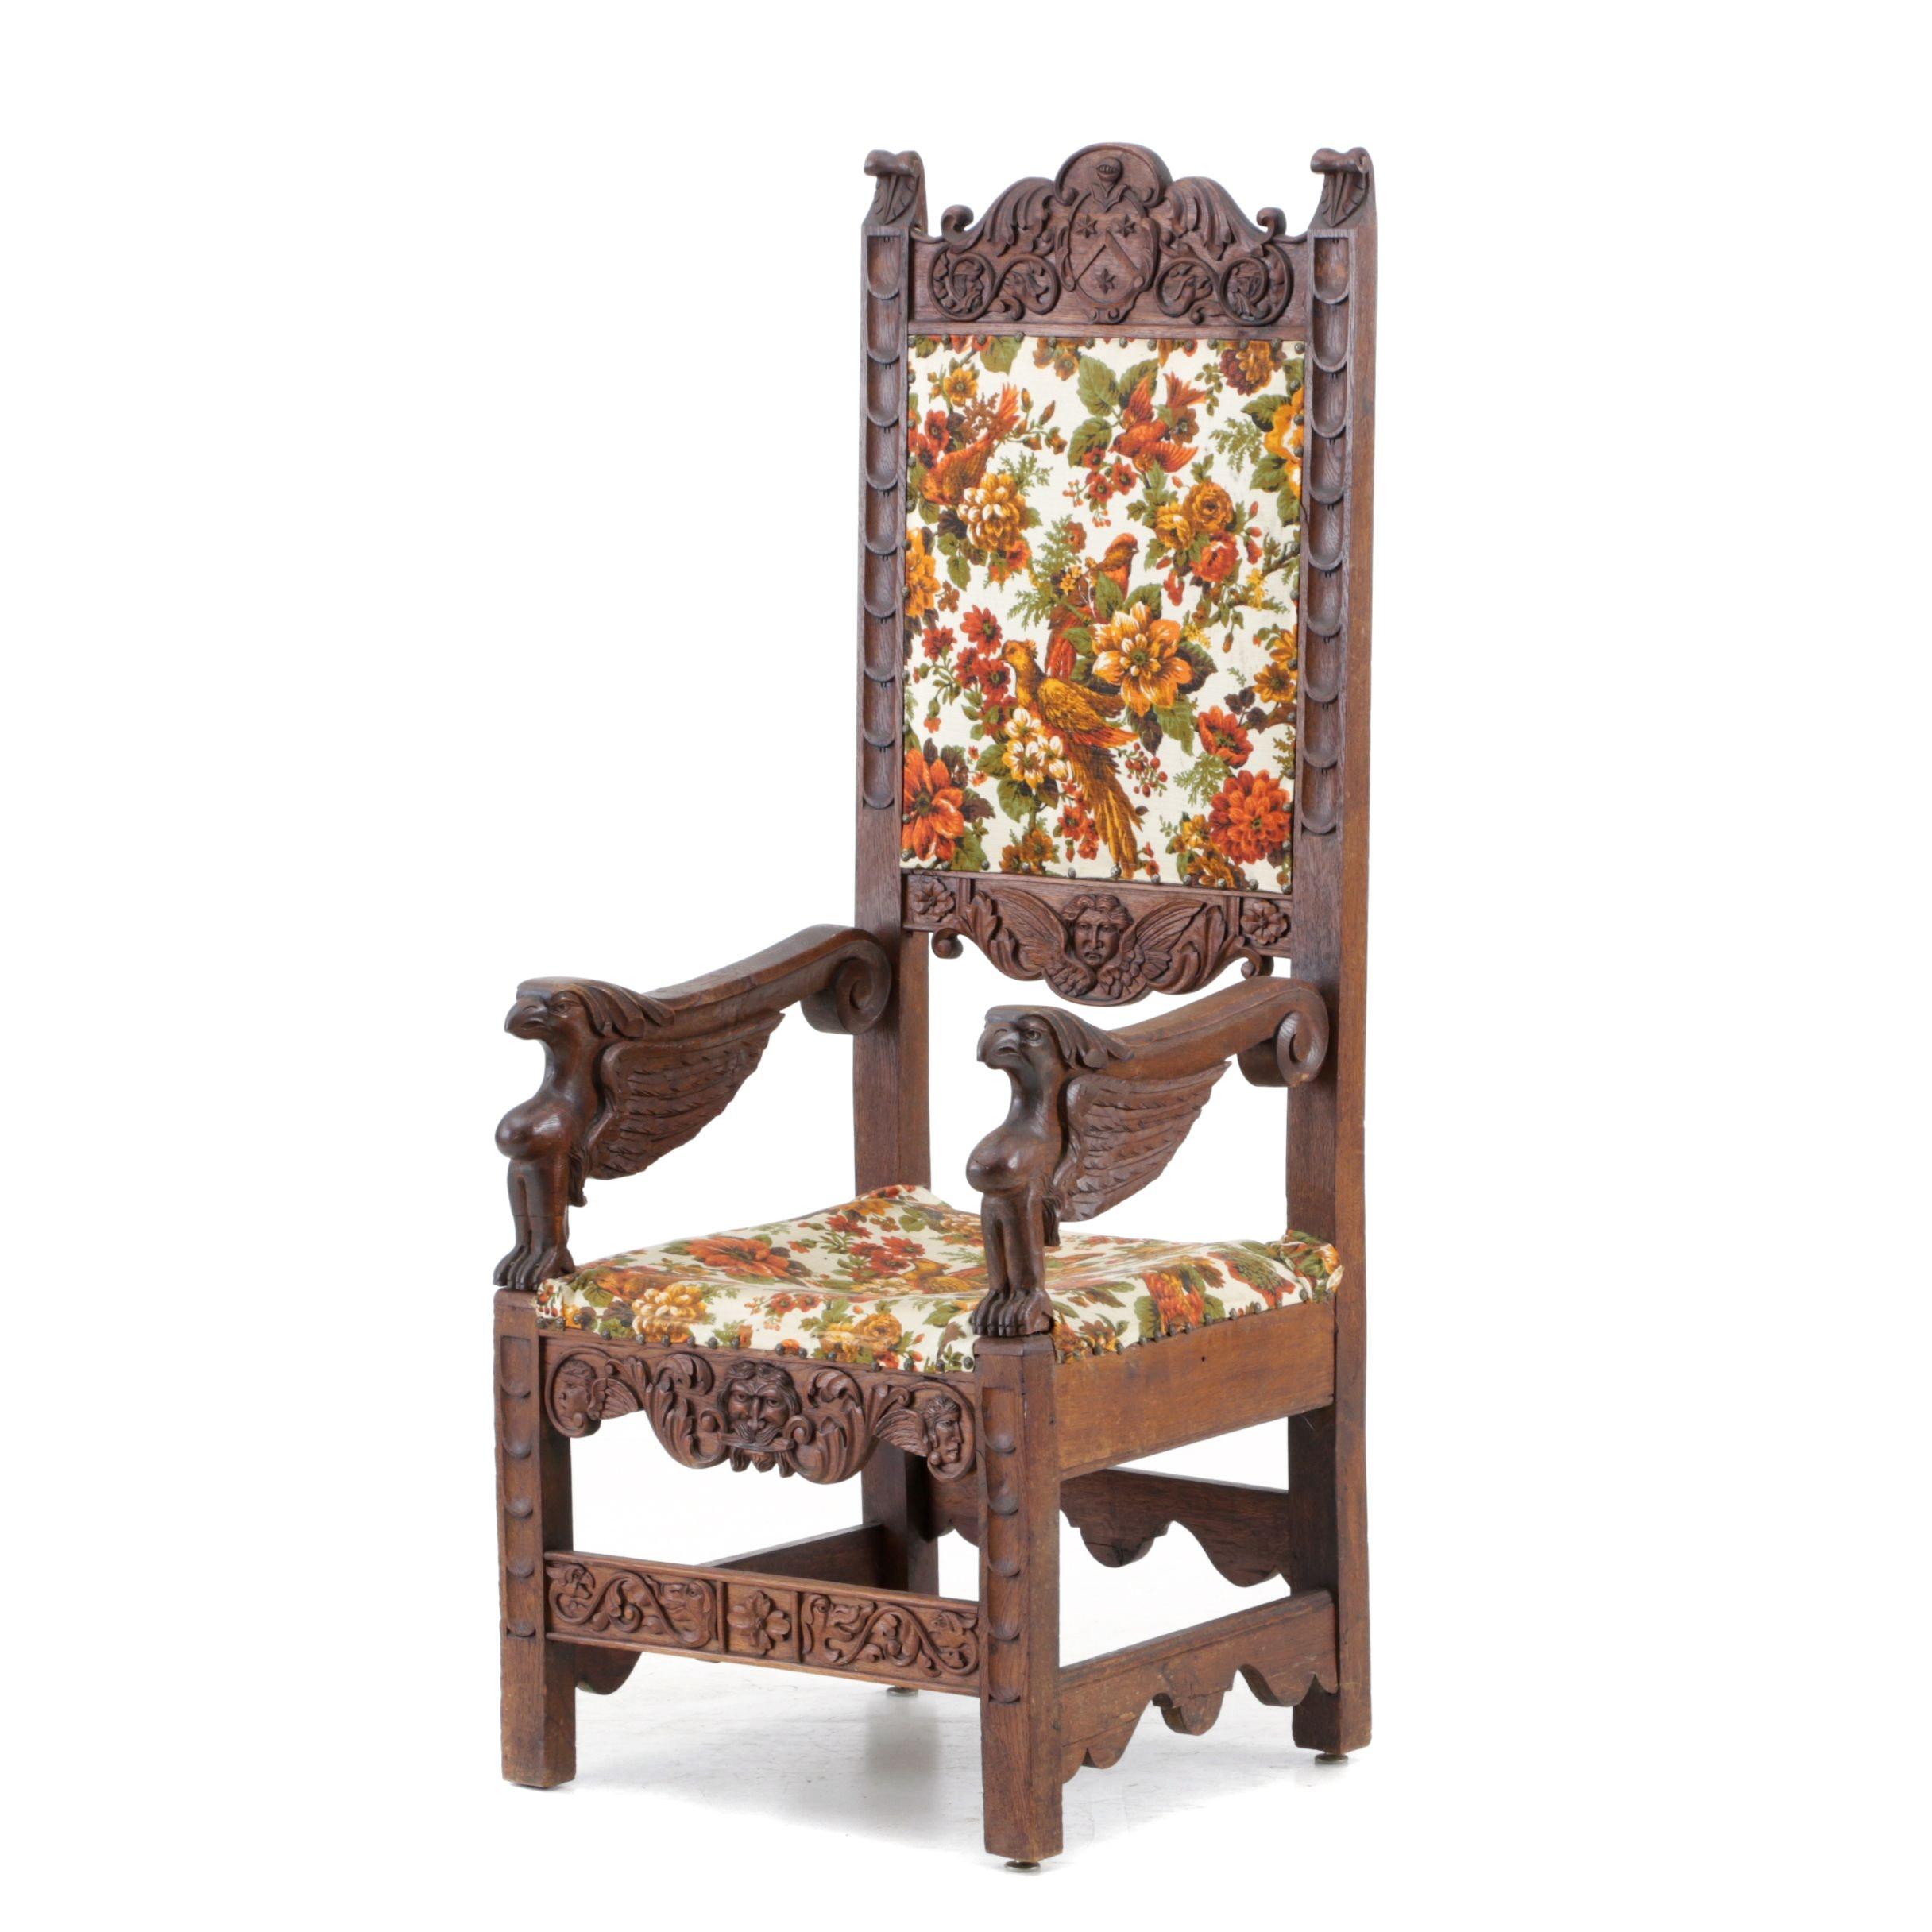 Italian Renaissance Revival Oak Chair, Mid-19th Century